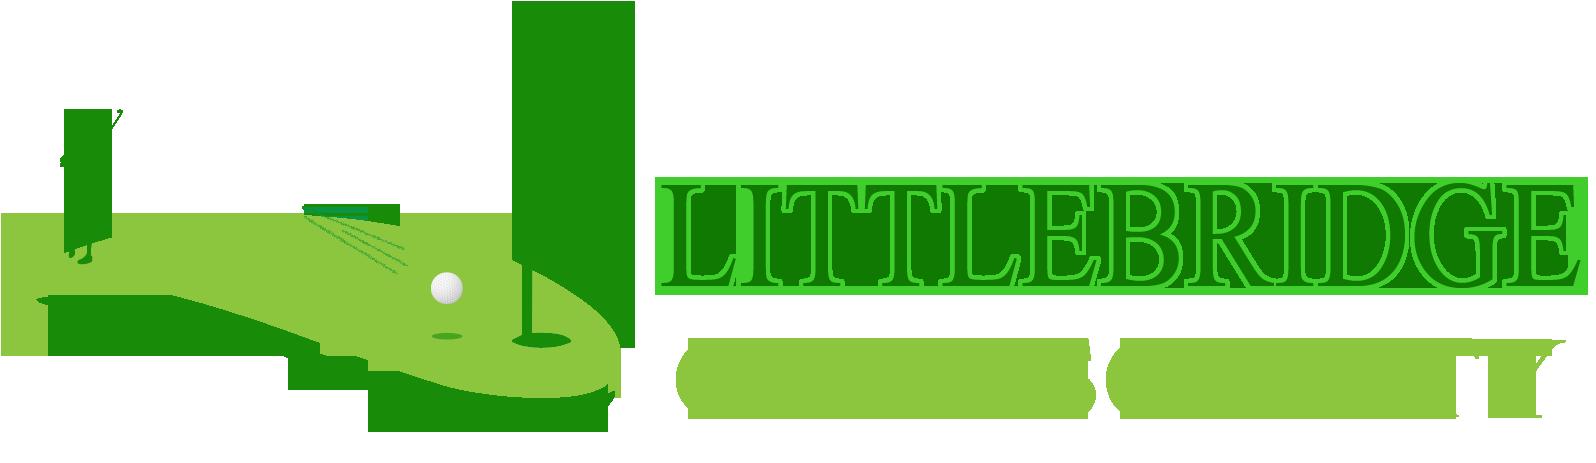 Littlebridge Golf Society